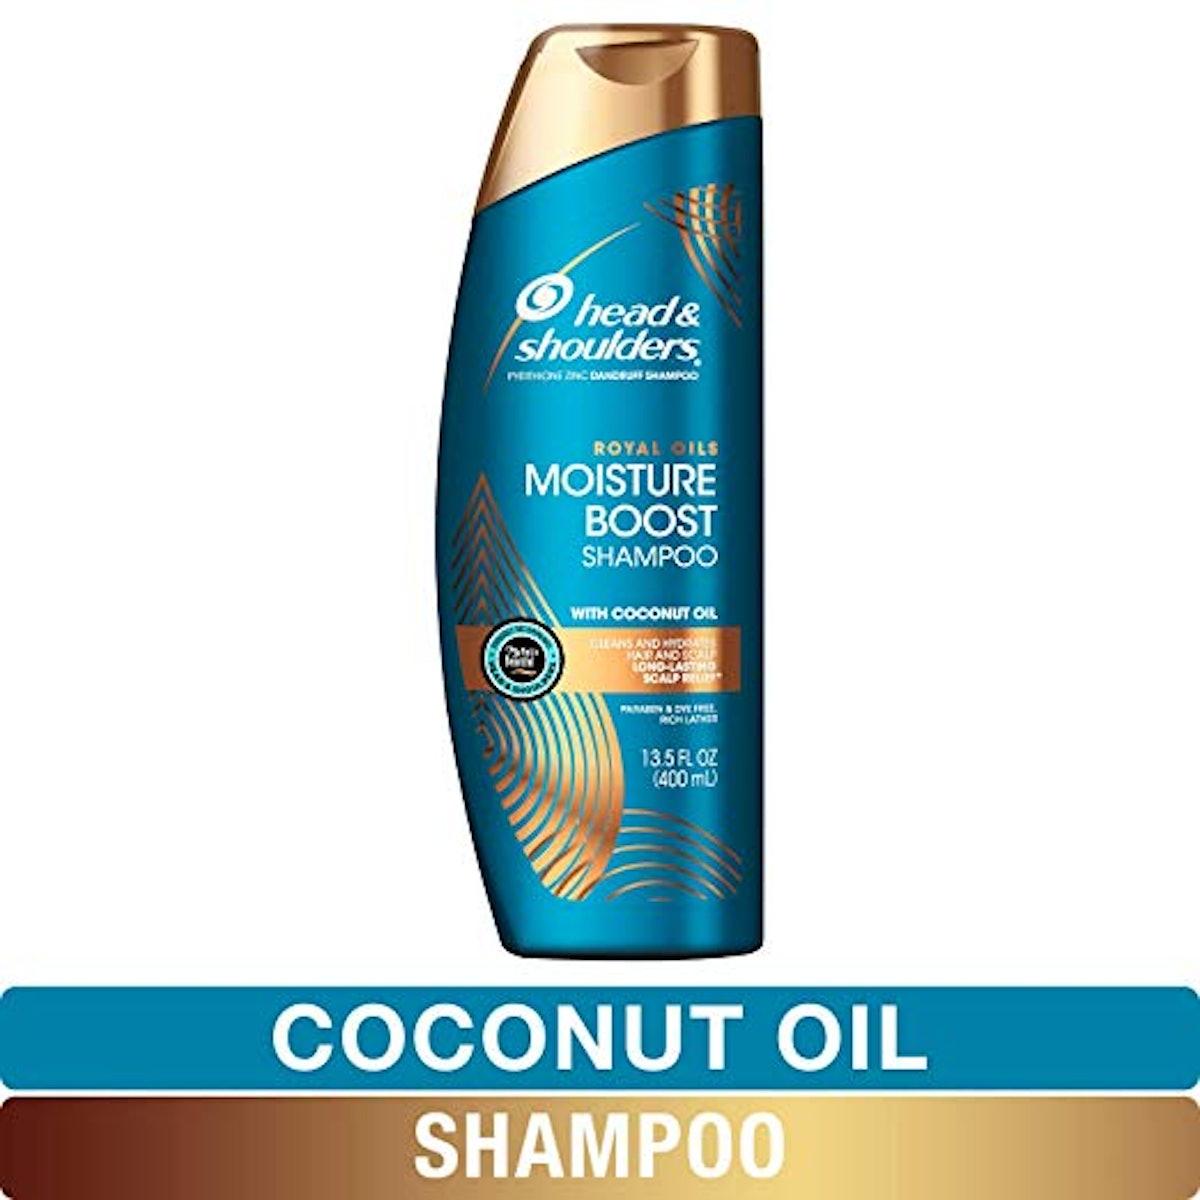 Head & Shoulders Royal Oils Moisture Boost Shampoo